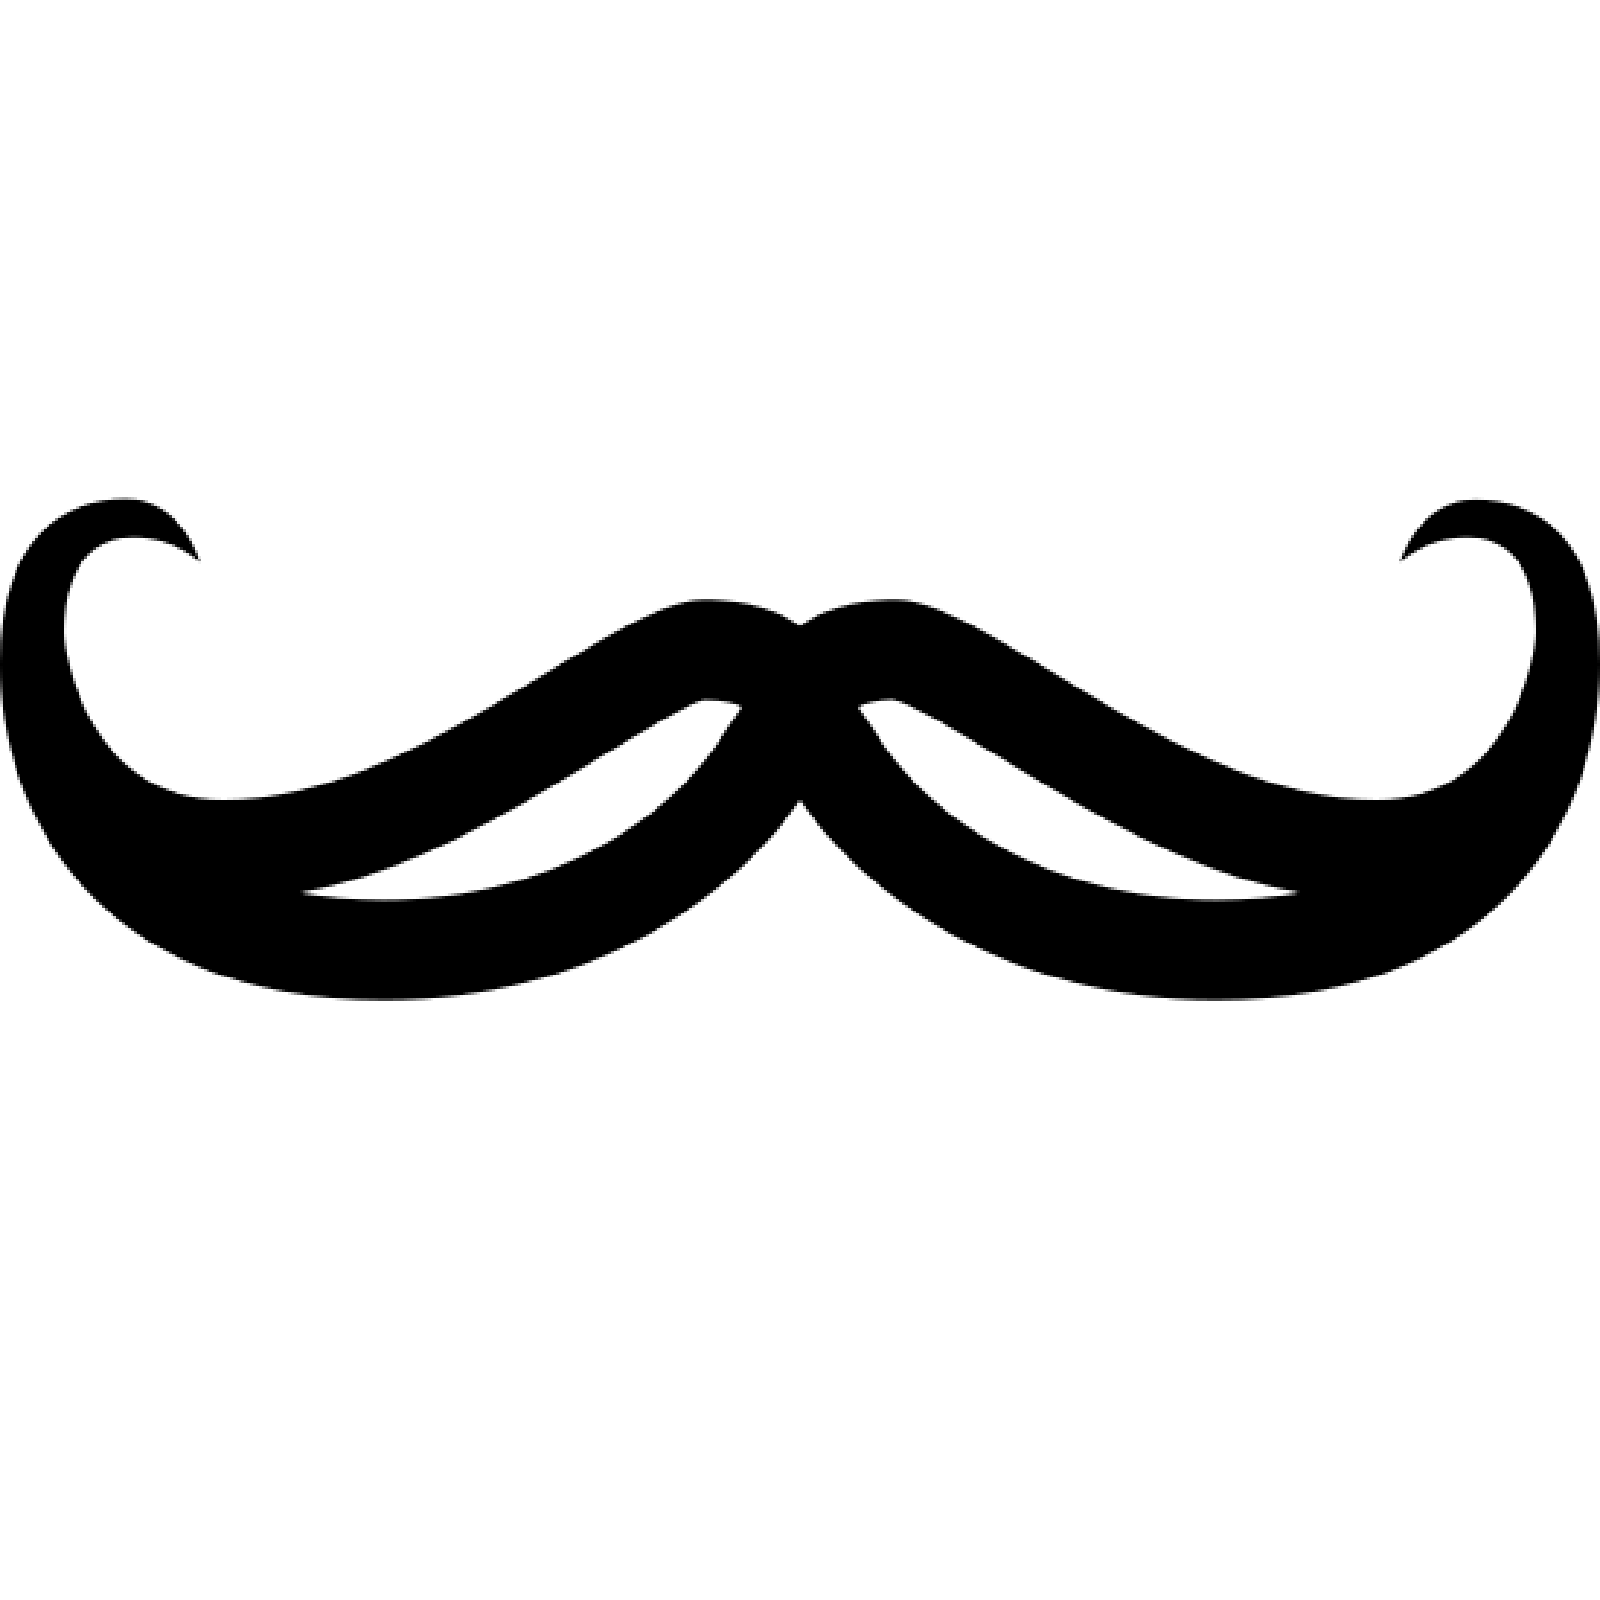 Handlebar Mustache icon